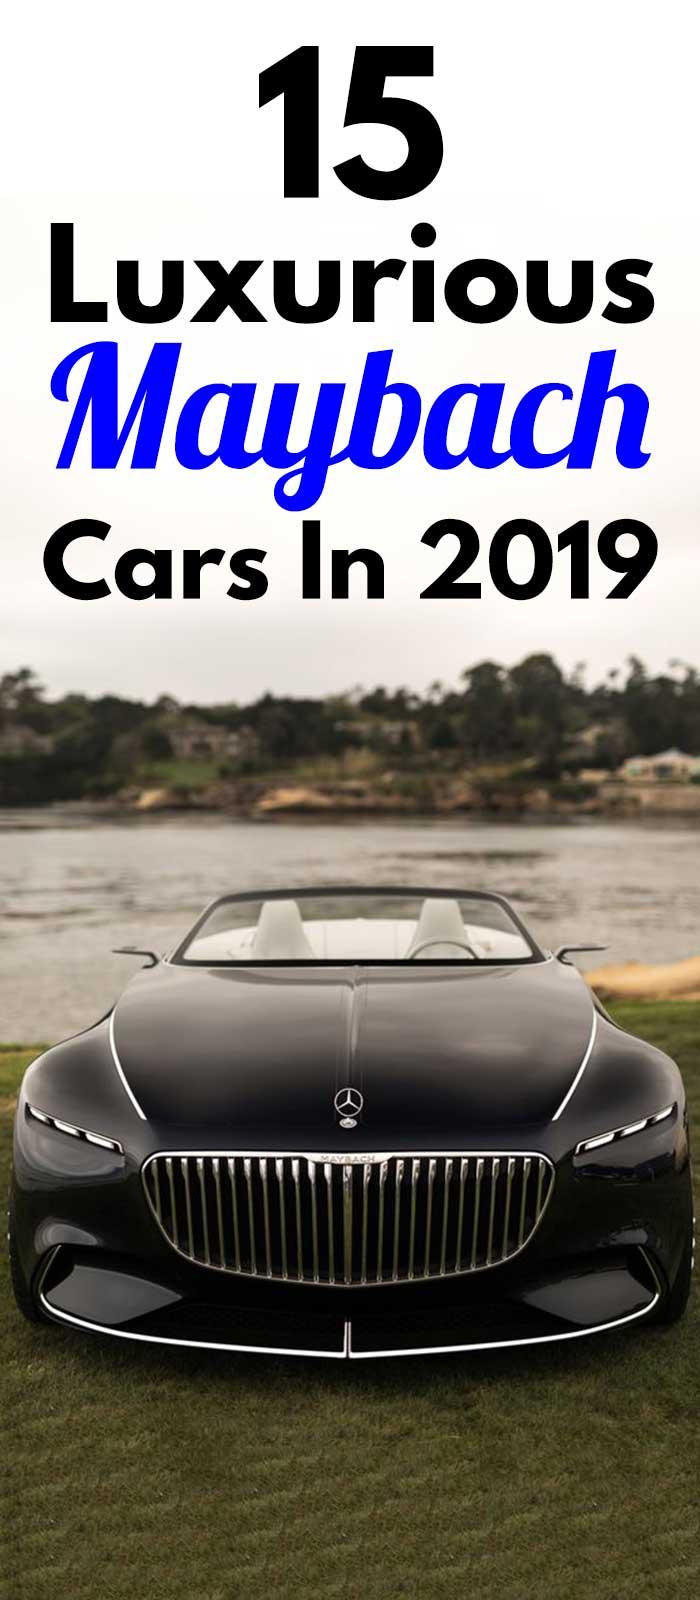 Luxurious Maybach Cars